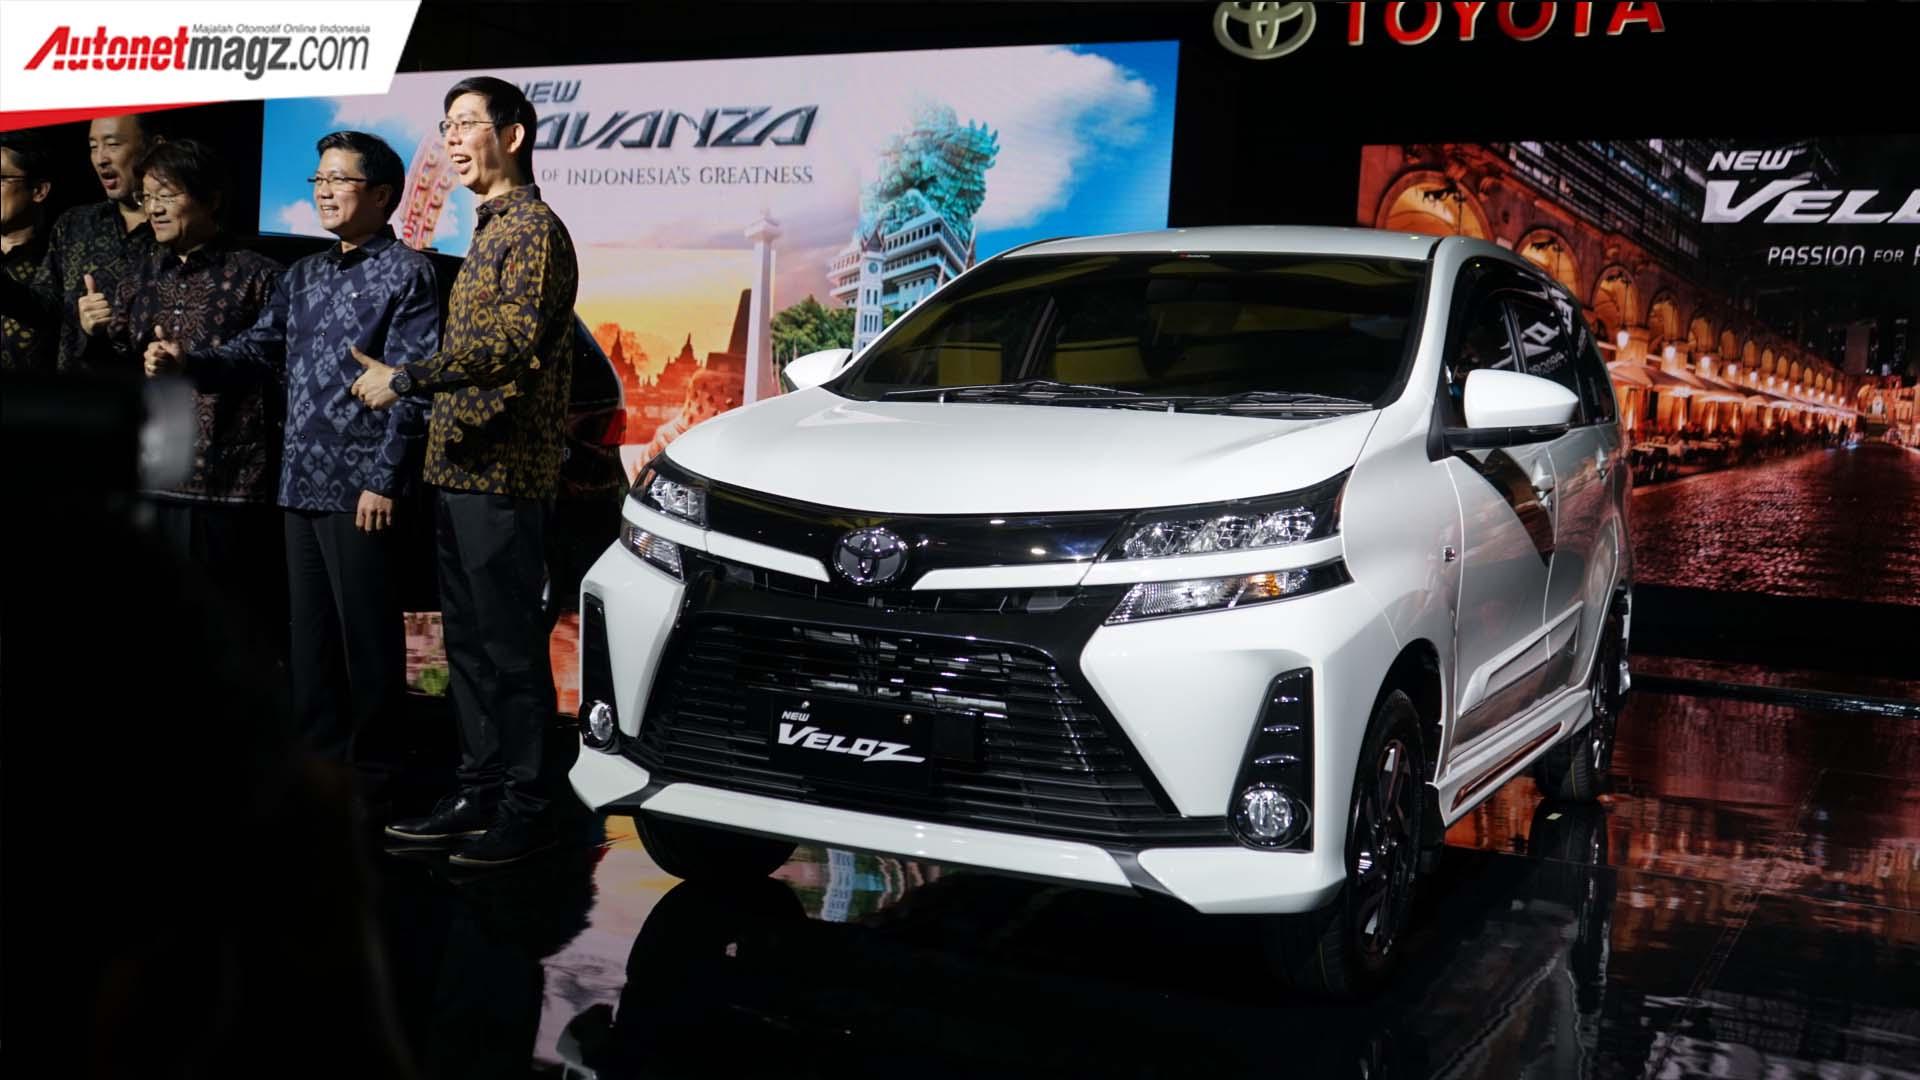 harga all new avanza veloz 2019 dimensi kijang innova toyota autonetmagz review mobil dan berita